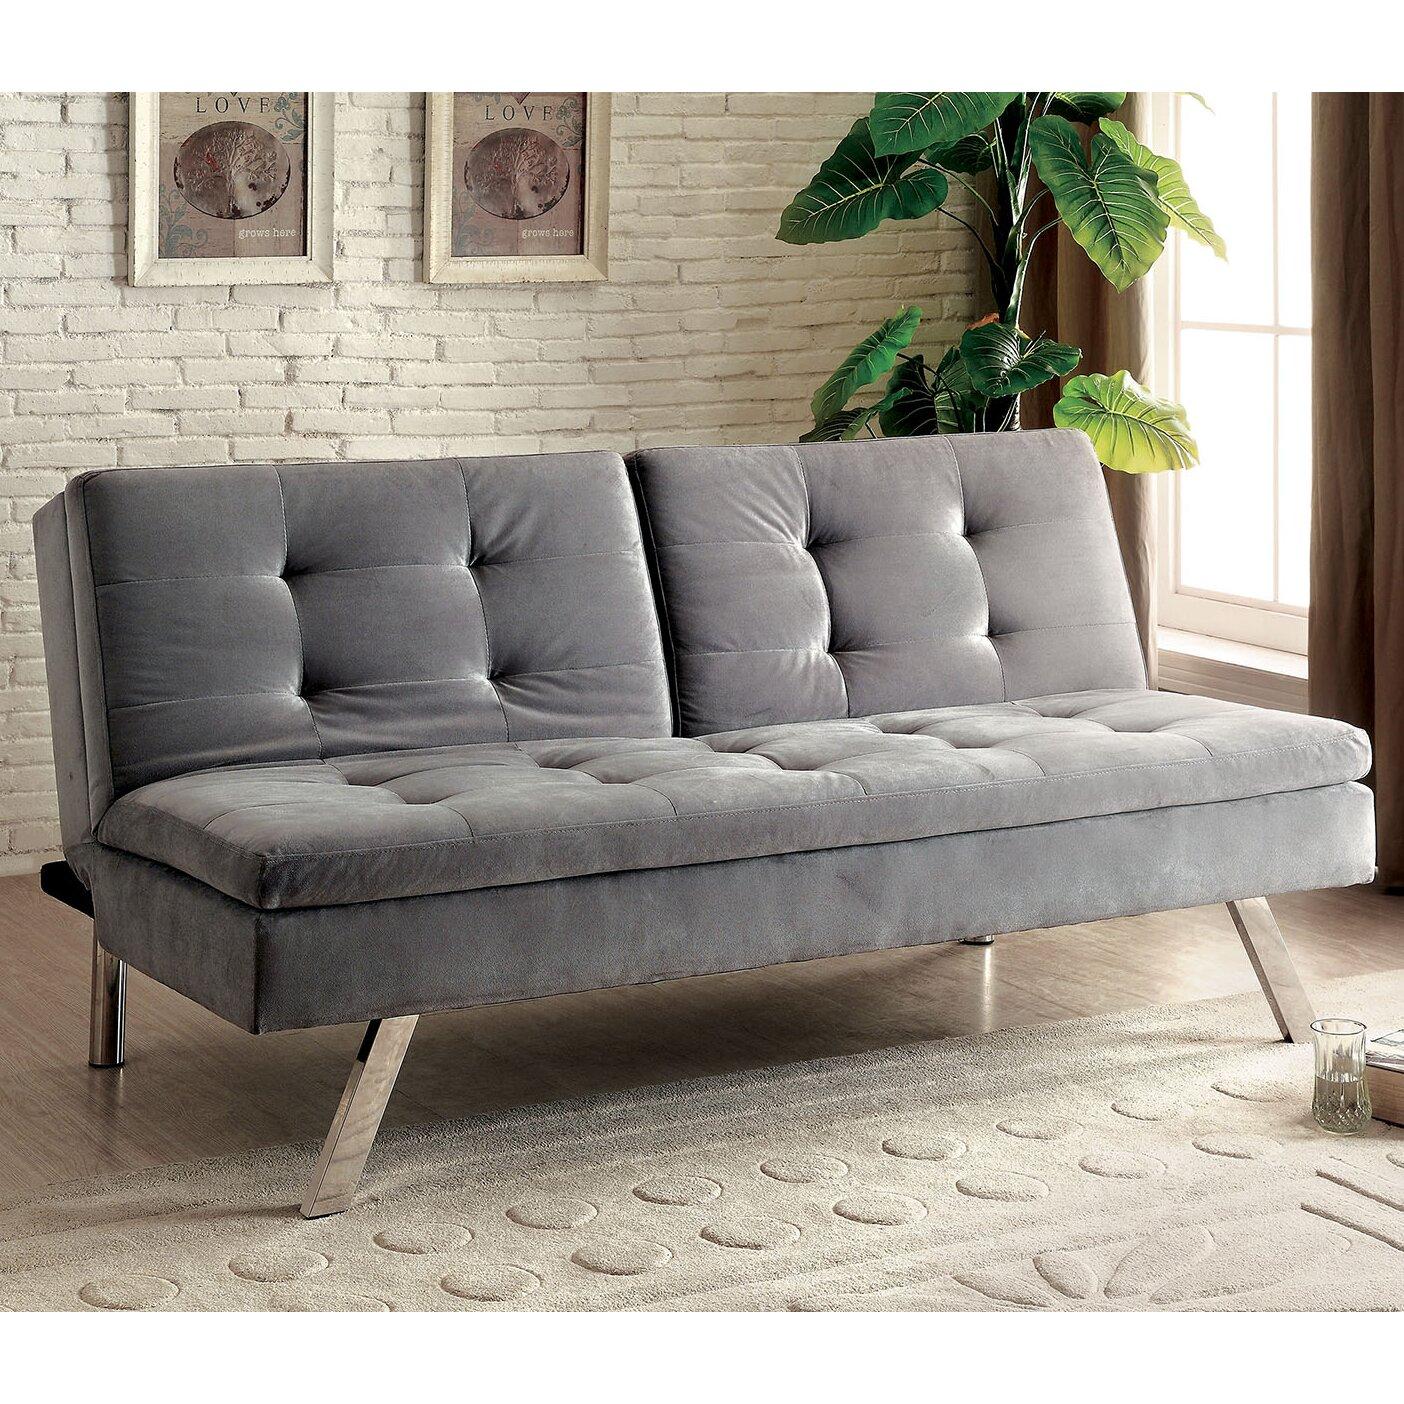 A Amp J Homes Studio Riverside Tufted Flannelette Sleeper Sofa